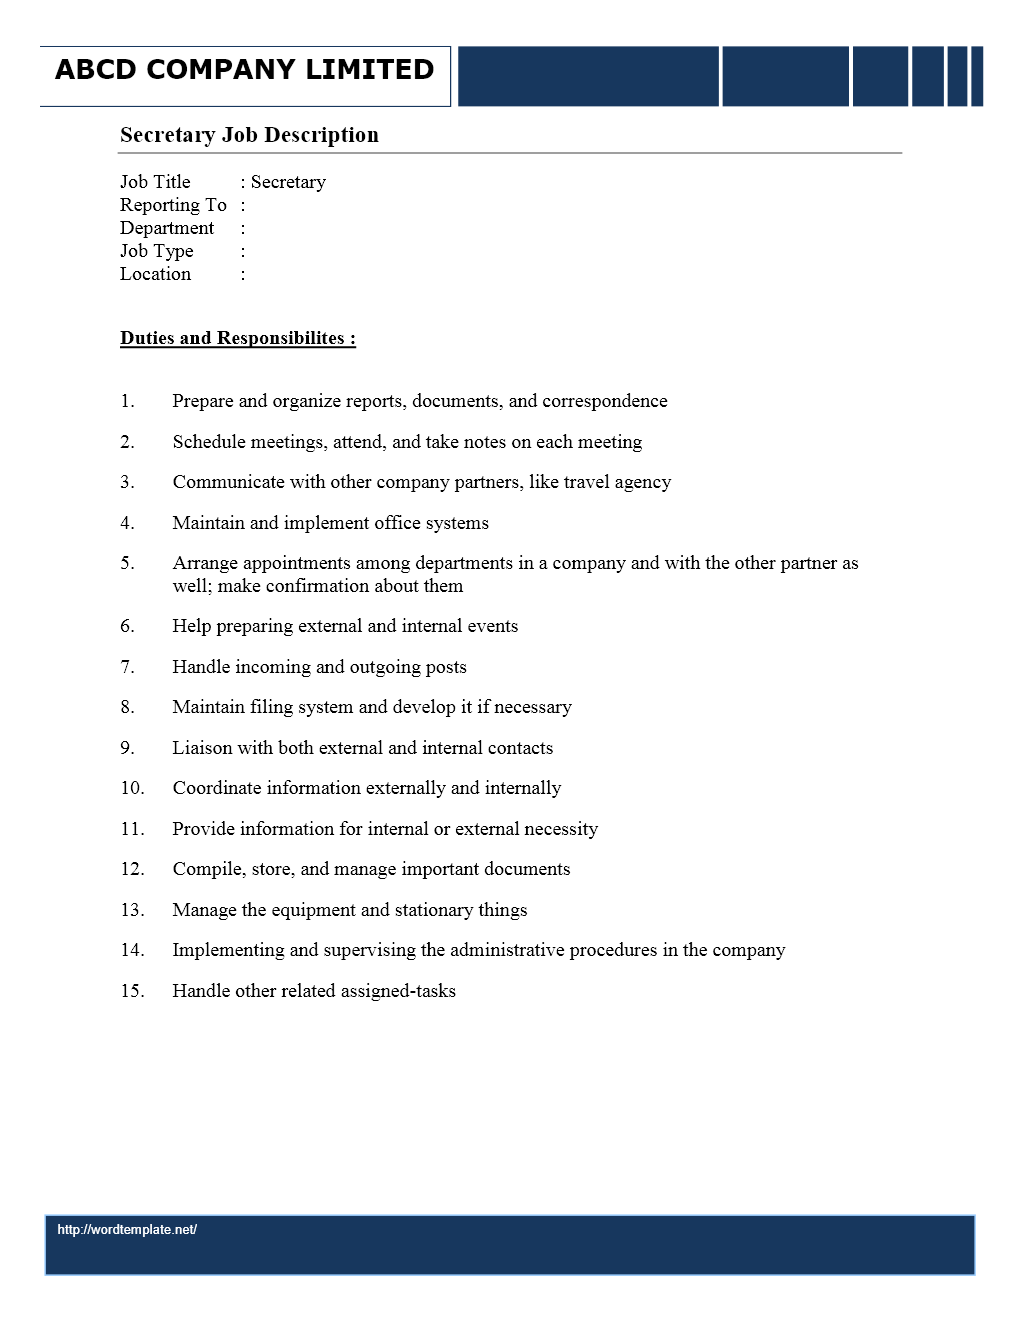 secretary job description